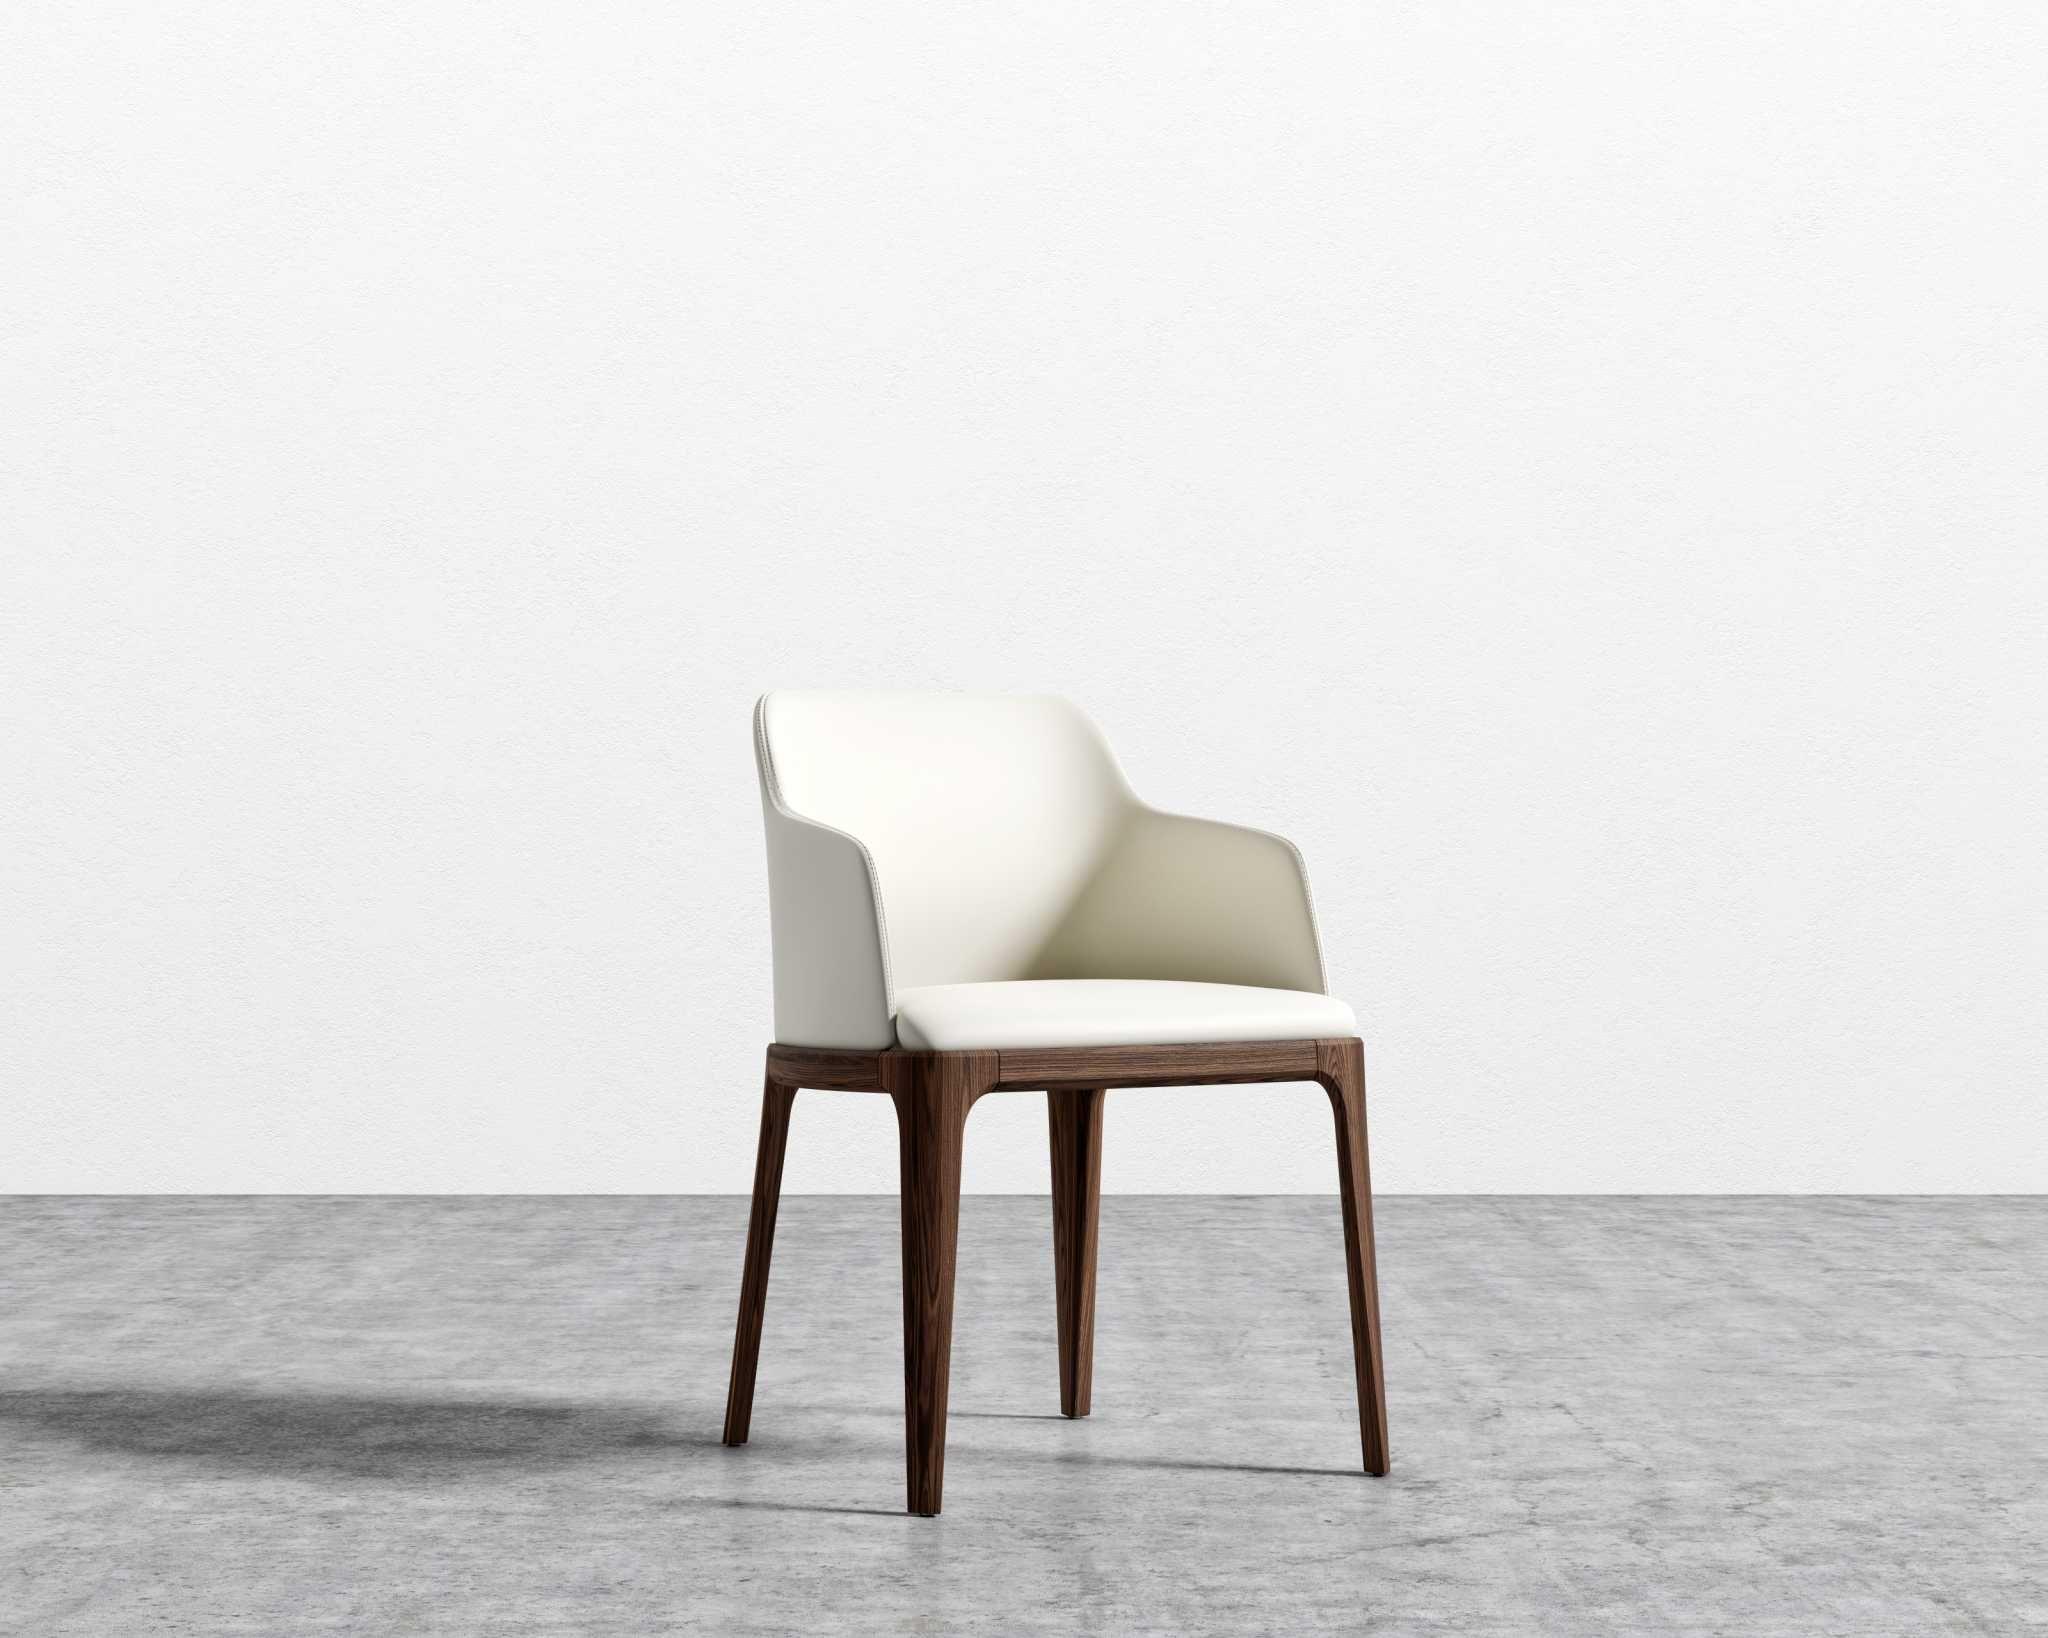 Excellent Aubrey Armchair Rove Concepts Rove Concepts Mid Century Creativecarmelina Interior Chair Design Creativecarmelinacom